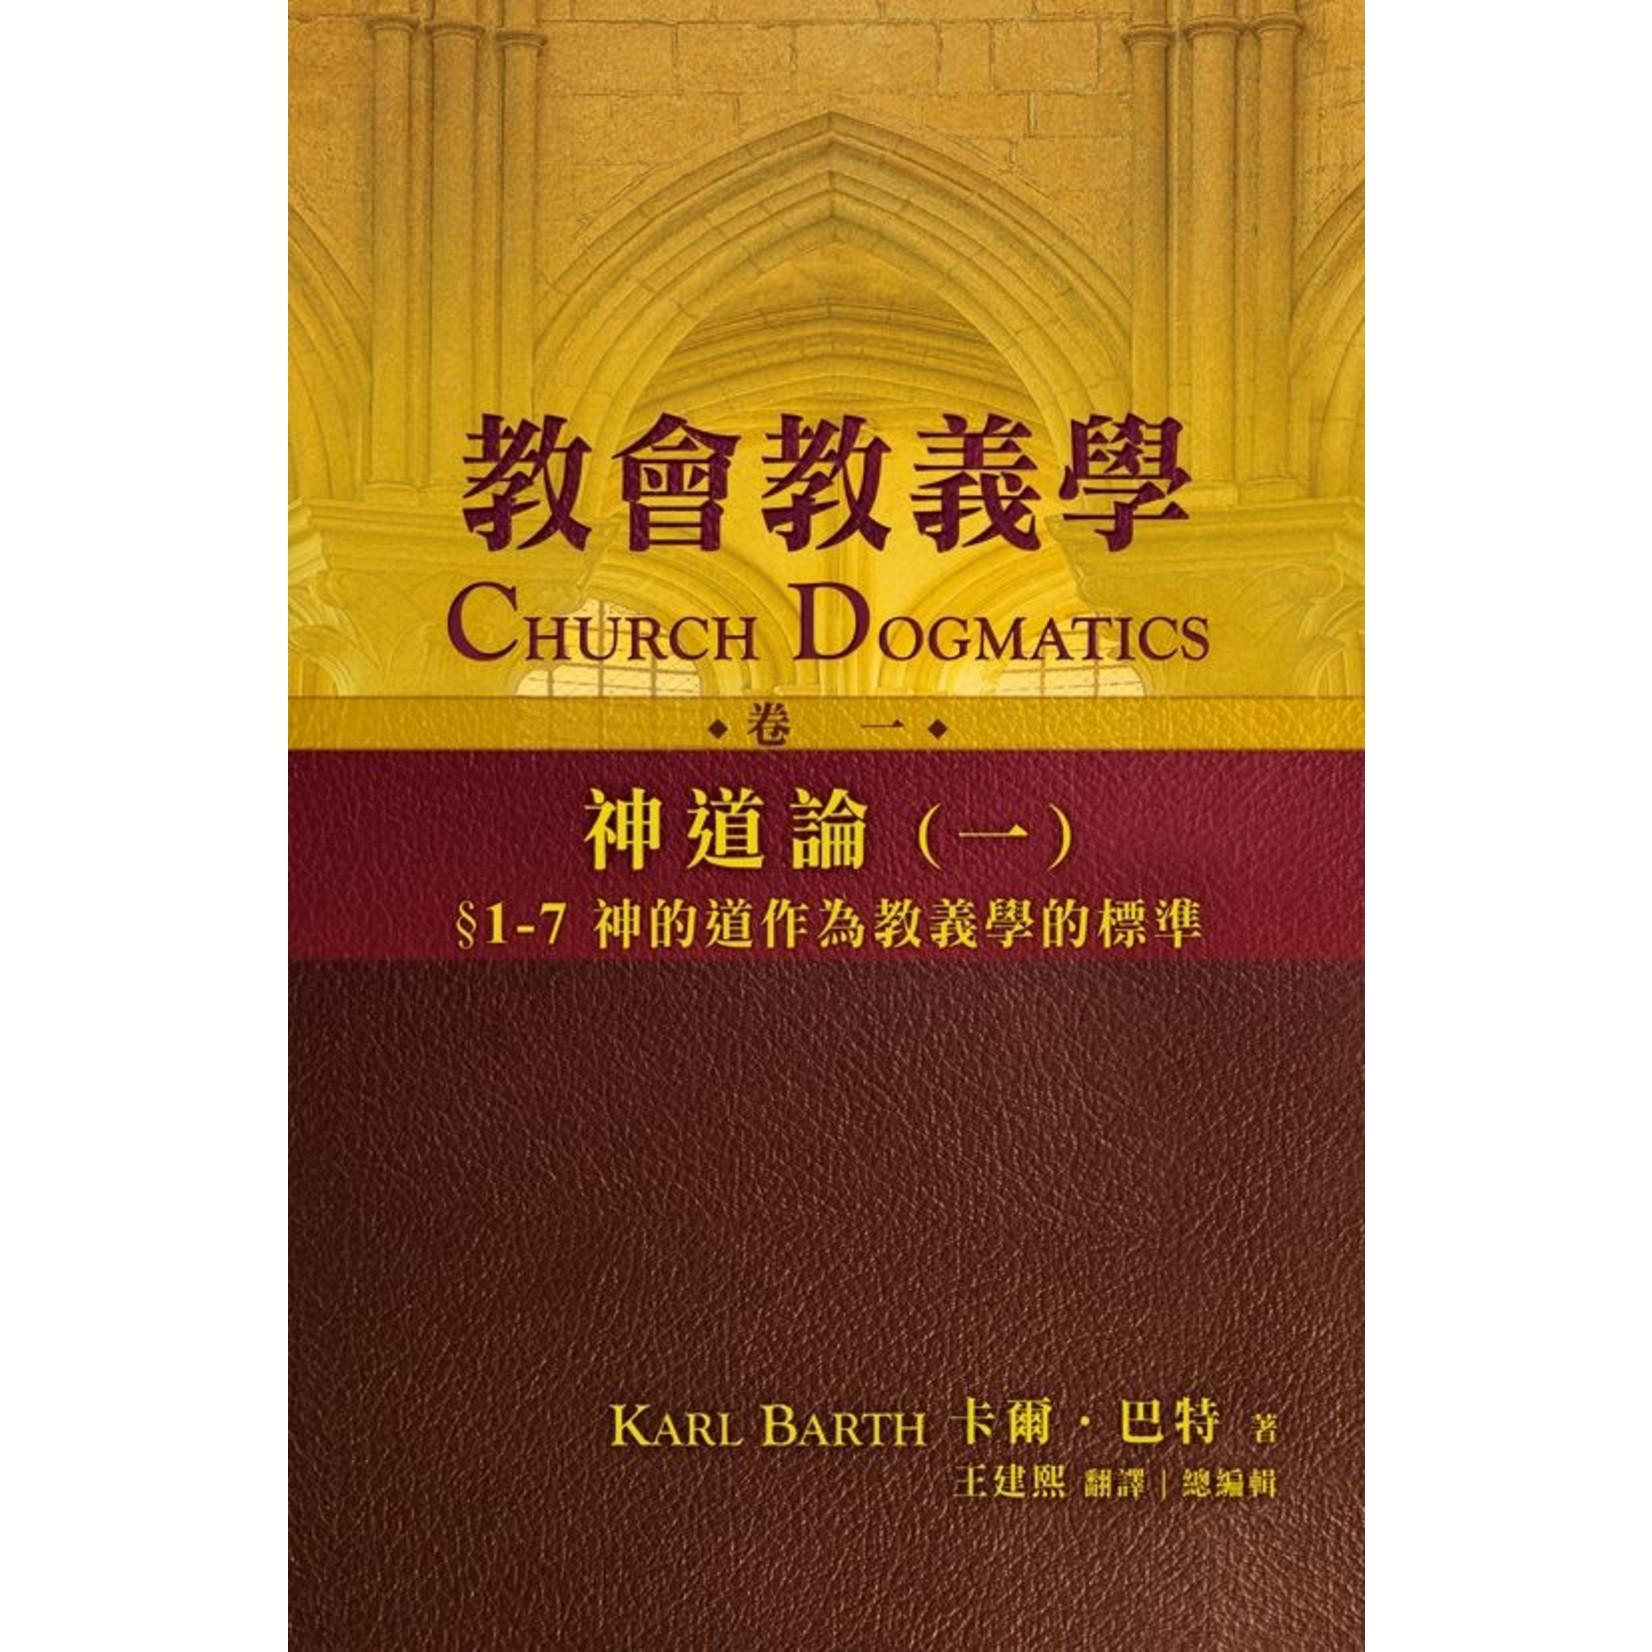 天道書樓 Tien Dao Publishing House 教會教義學(卷一):神道論(一)——1-7神的道作為教義學的標準 Church Dogmatics: The Doctrine of the Word of God I.1(A)